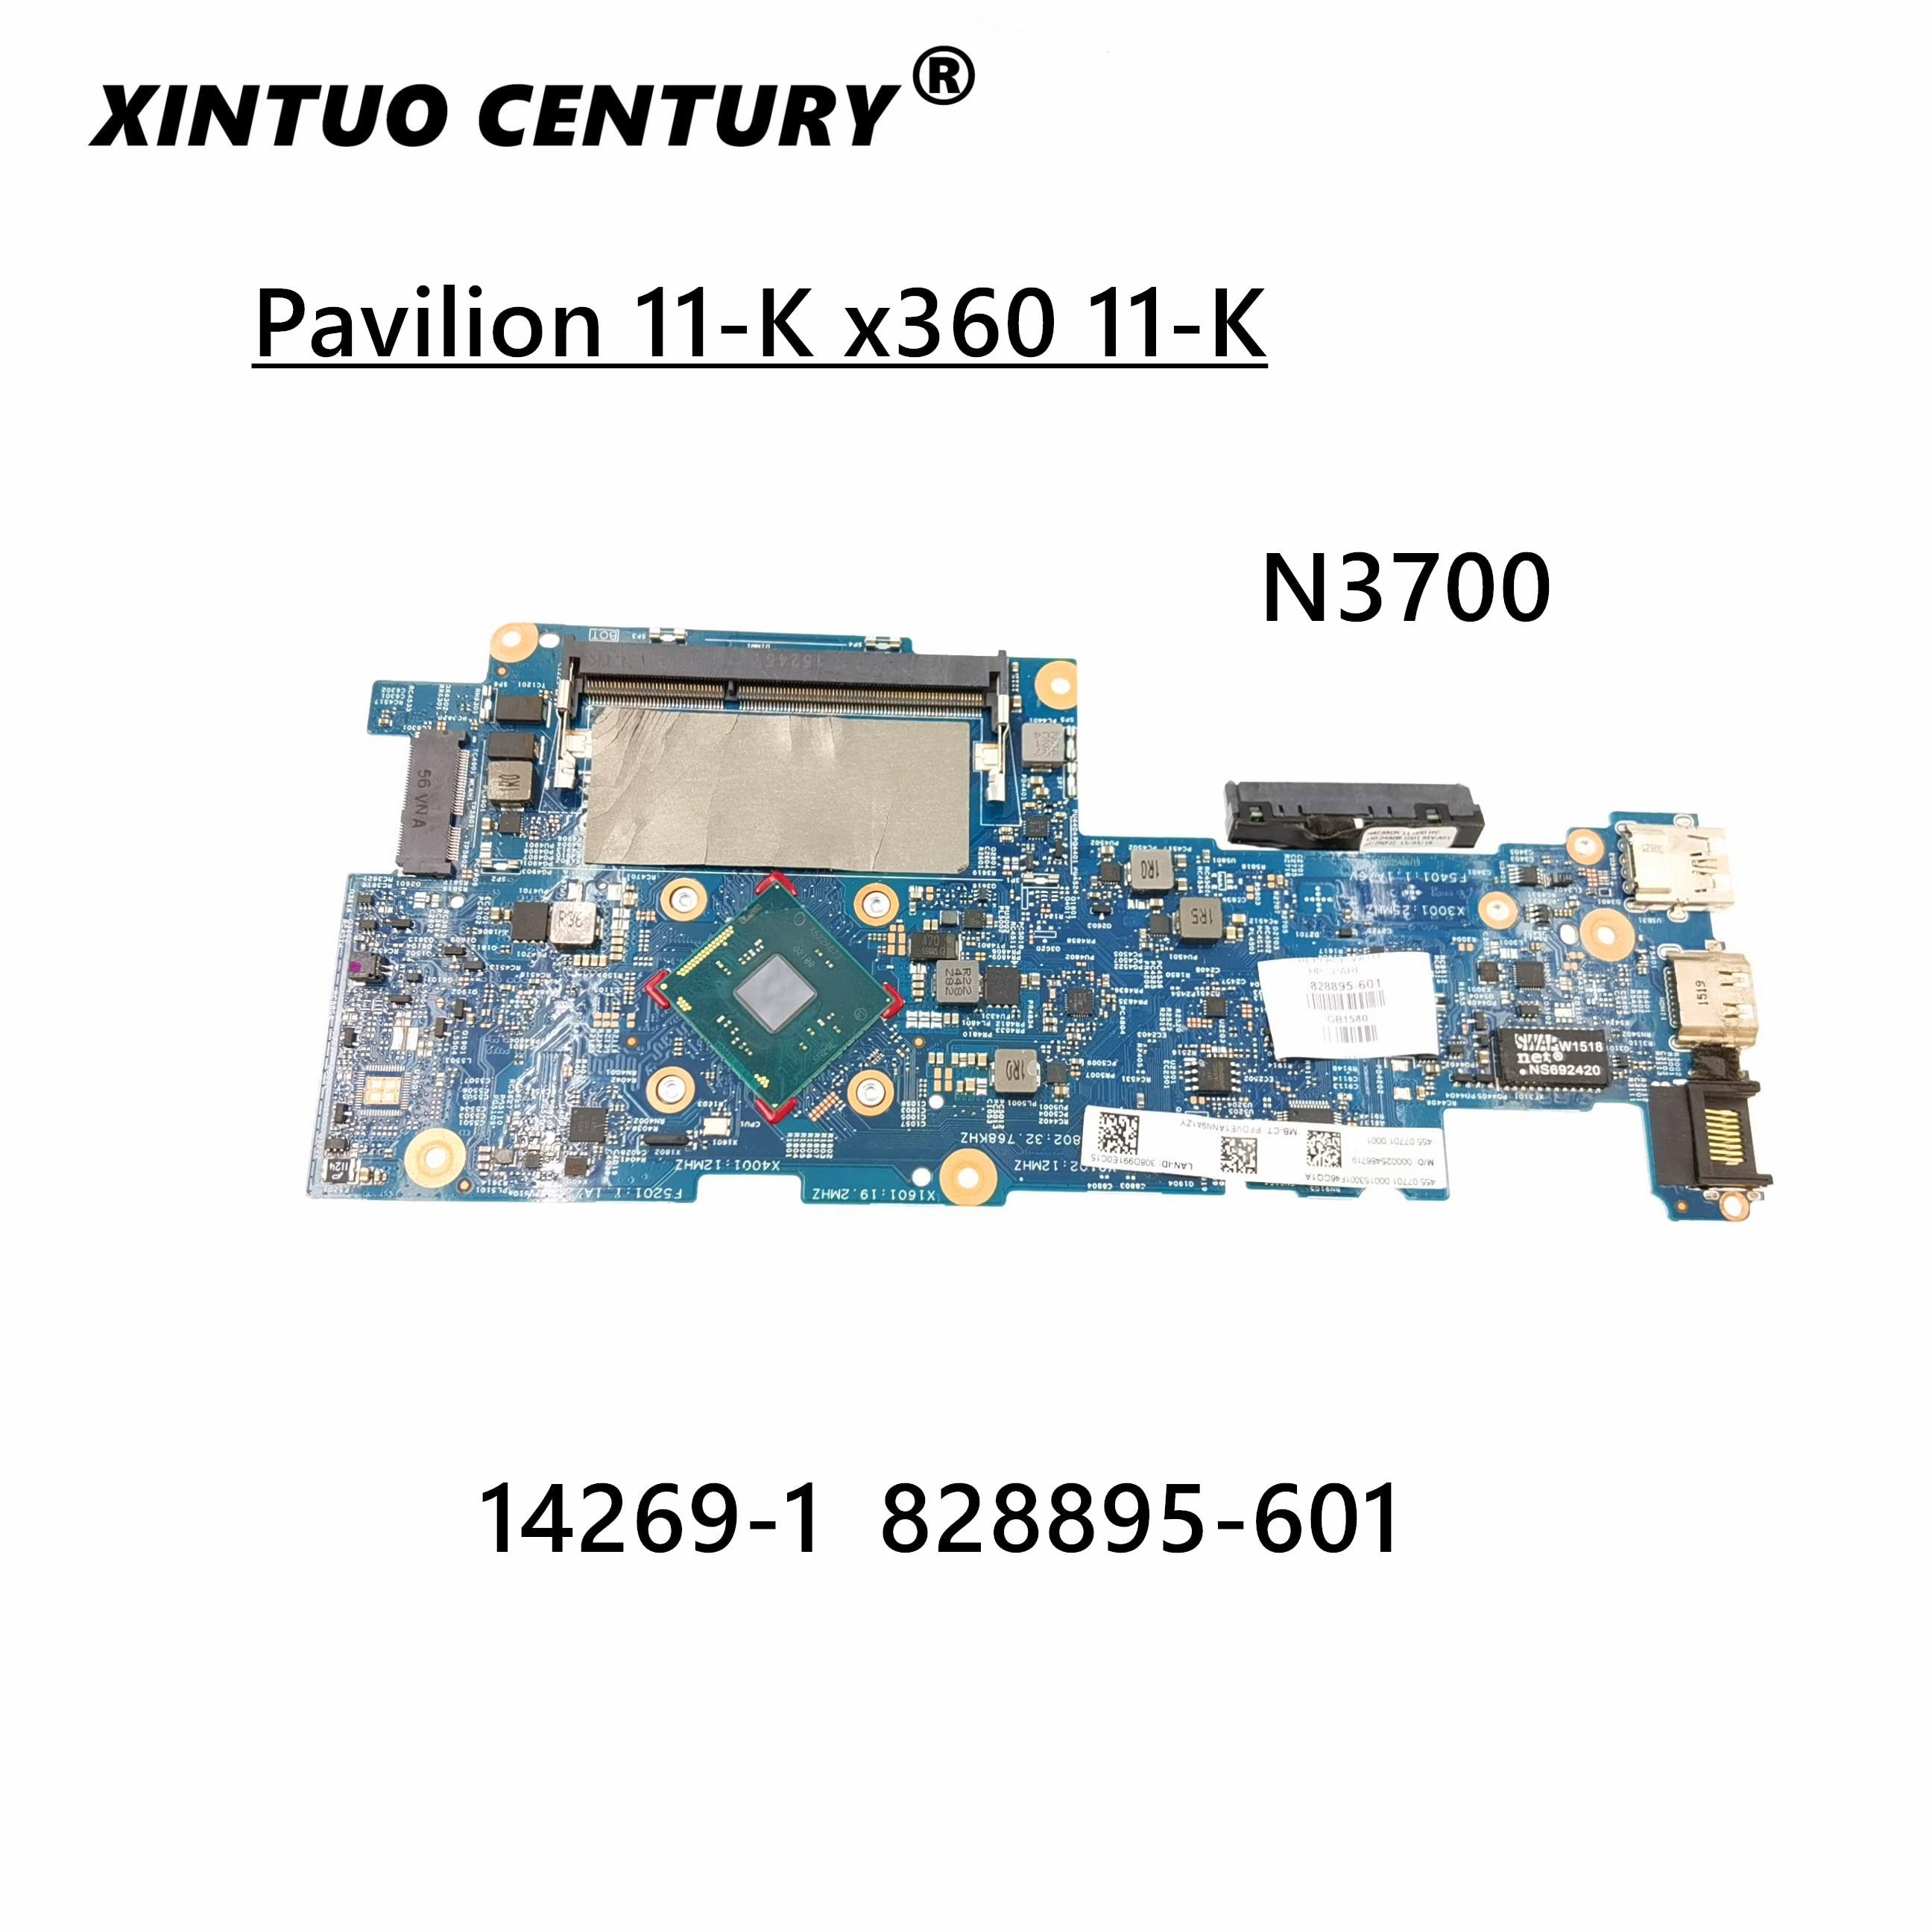 Материнская плата для ноутбука HP Pavilion 11-K x360 11-K128CA 828895-001 828895-601 14269-1 с процессором N3700 DDR3L 100% рабочий